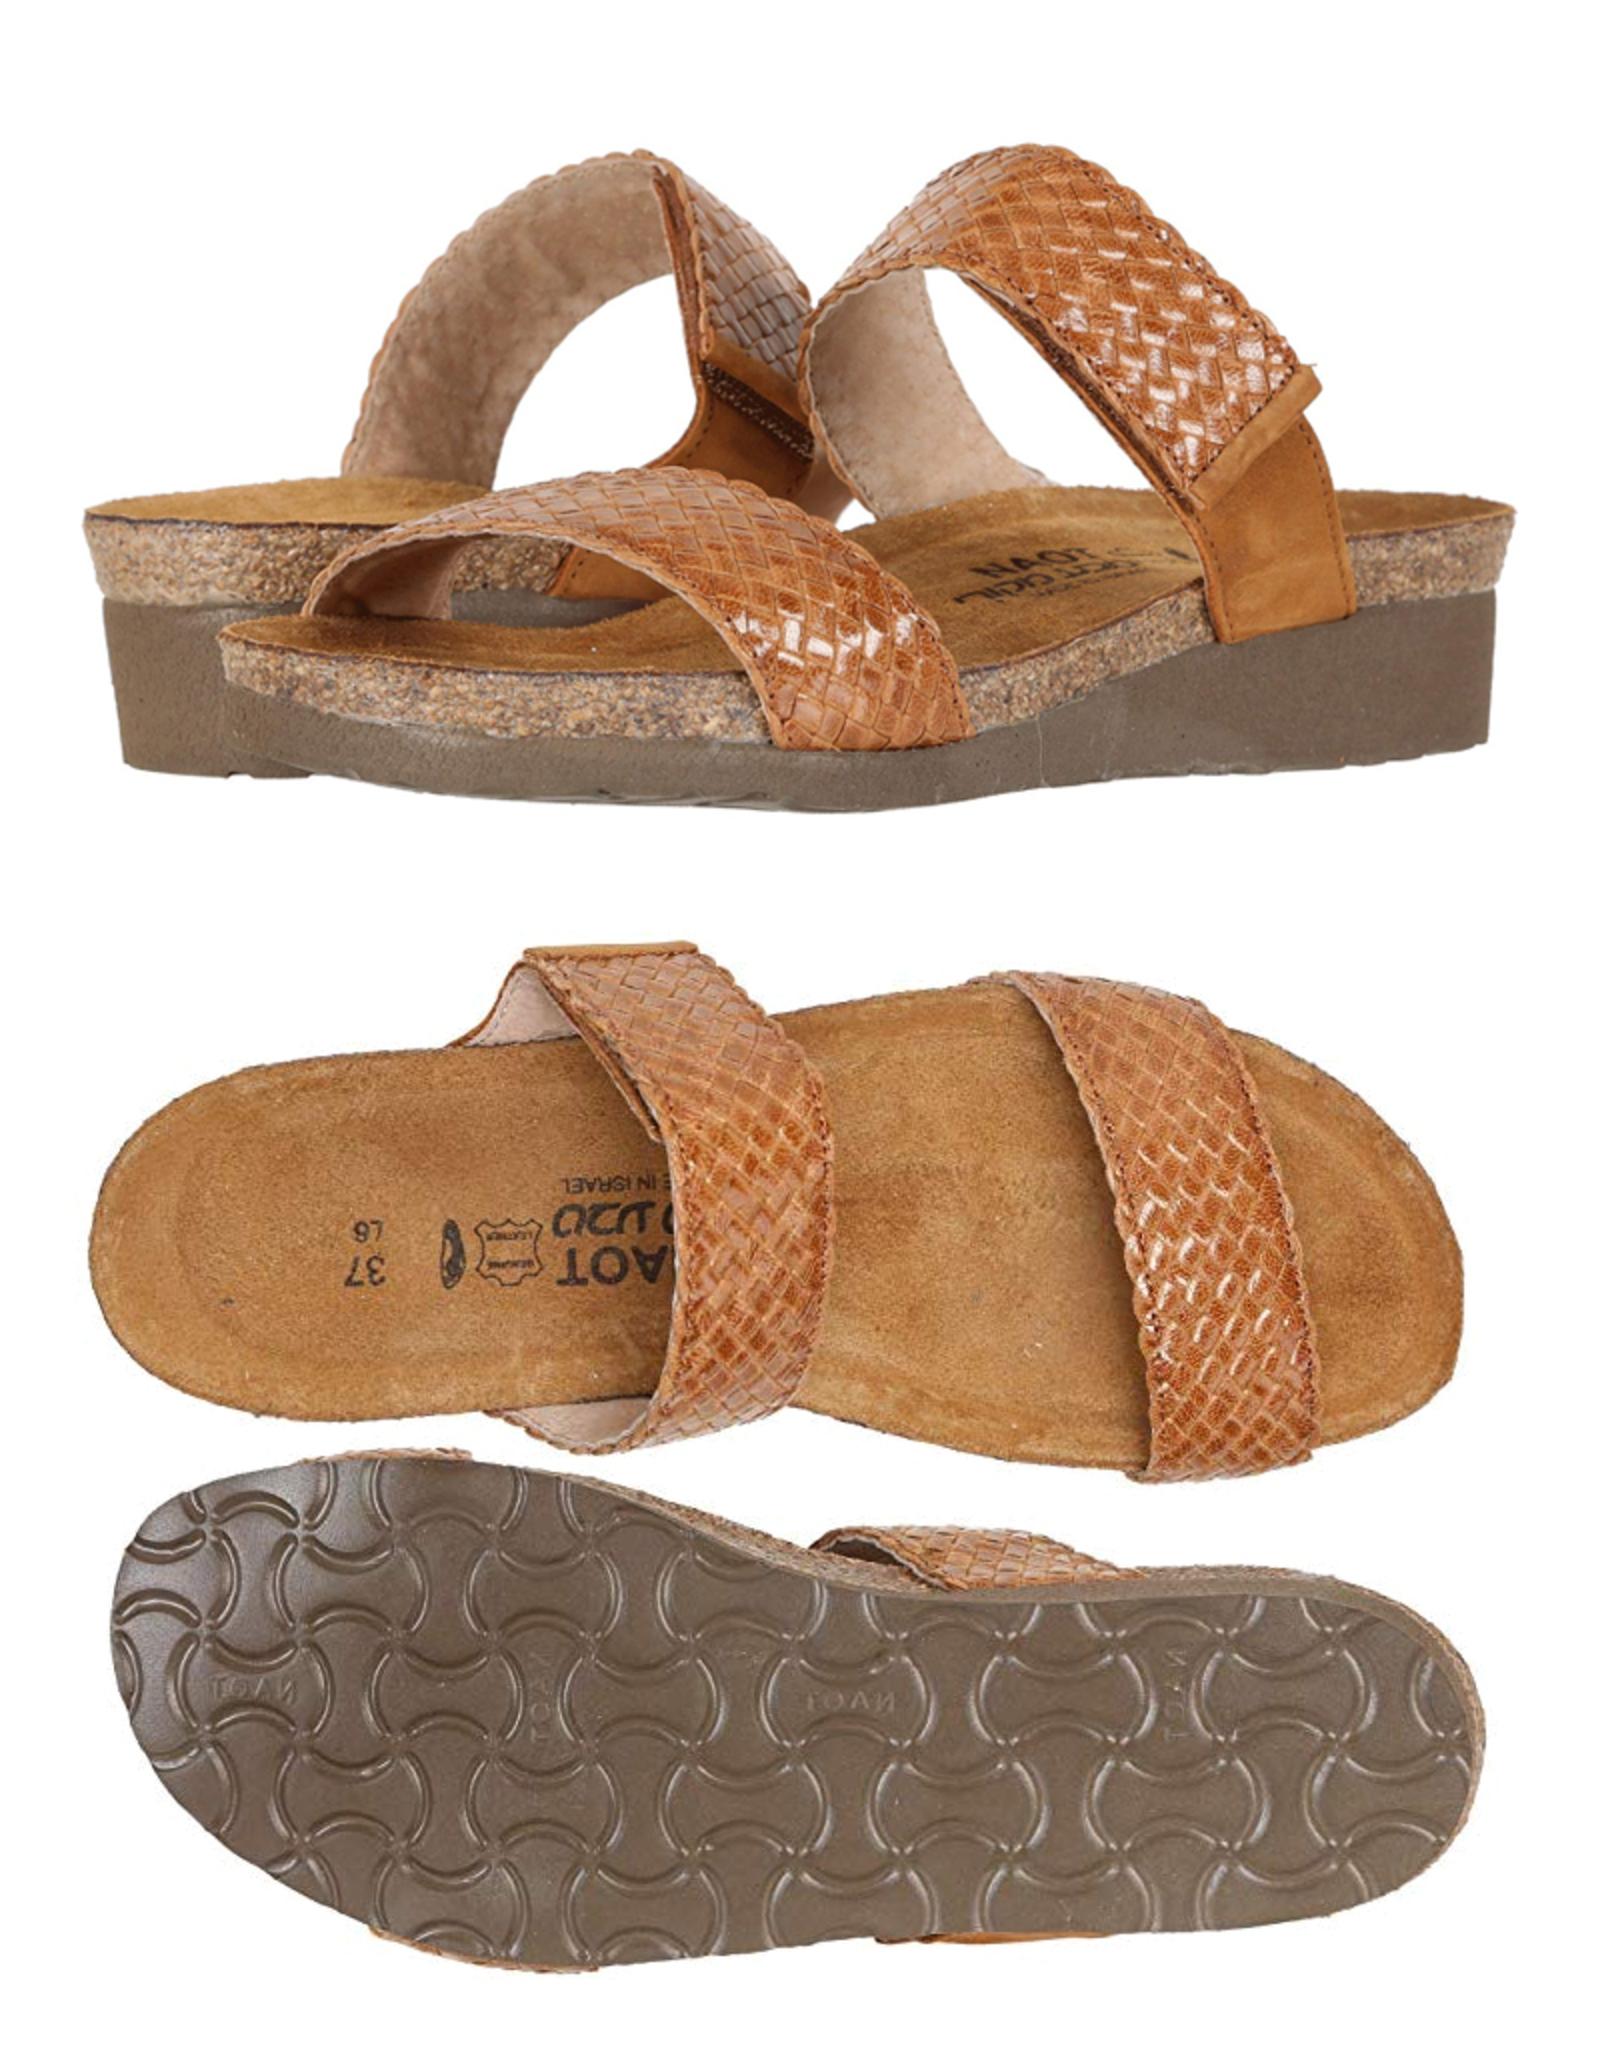 Naot/Yaleet Blake Braided Leather Open Back Sandals